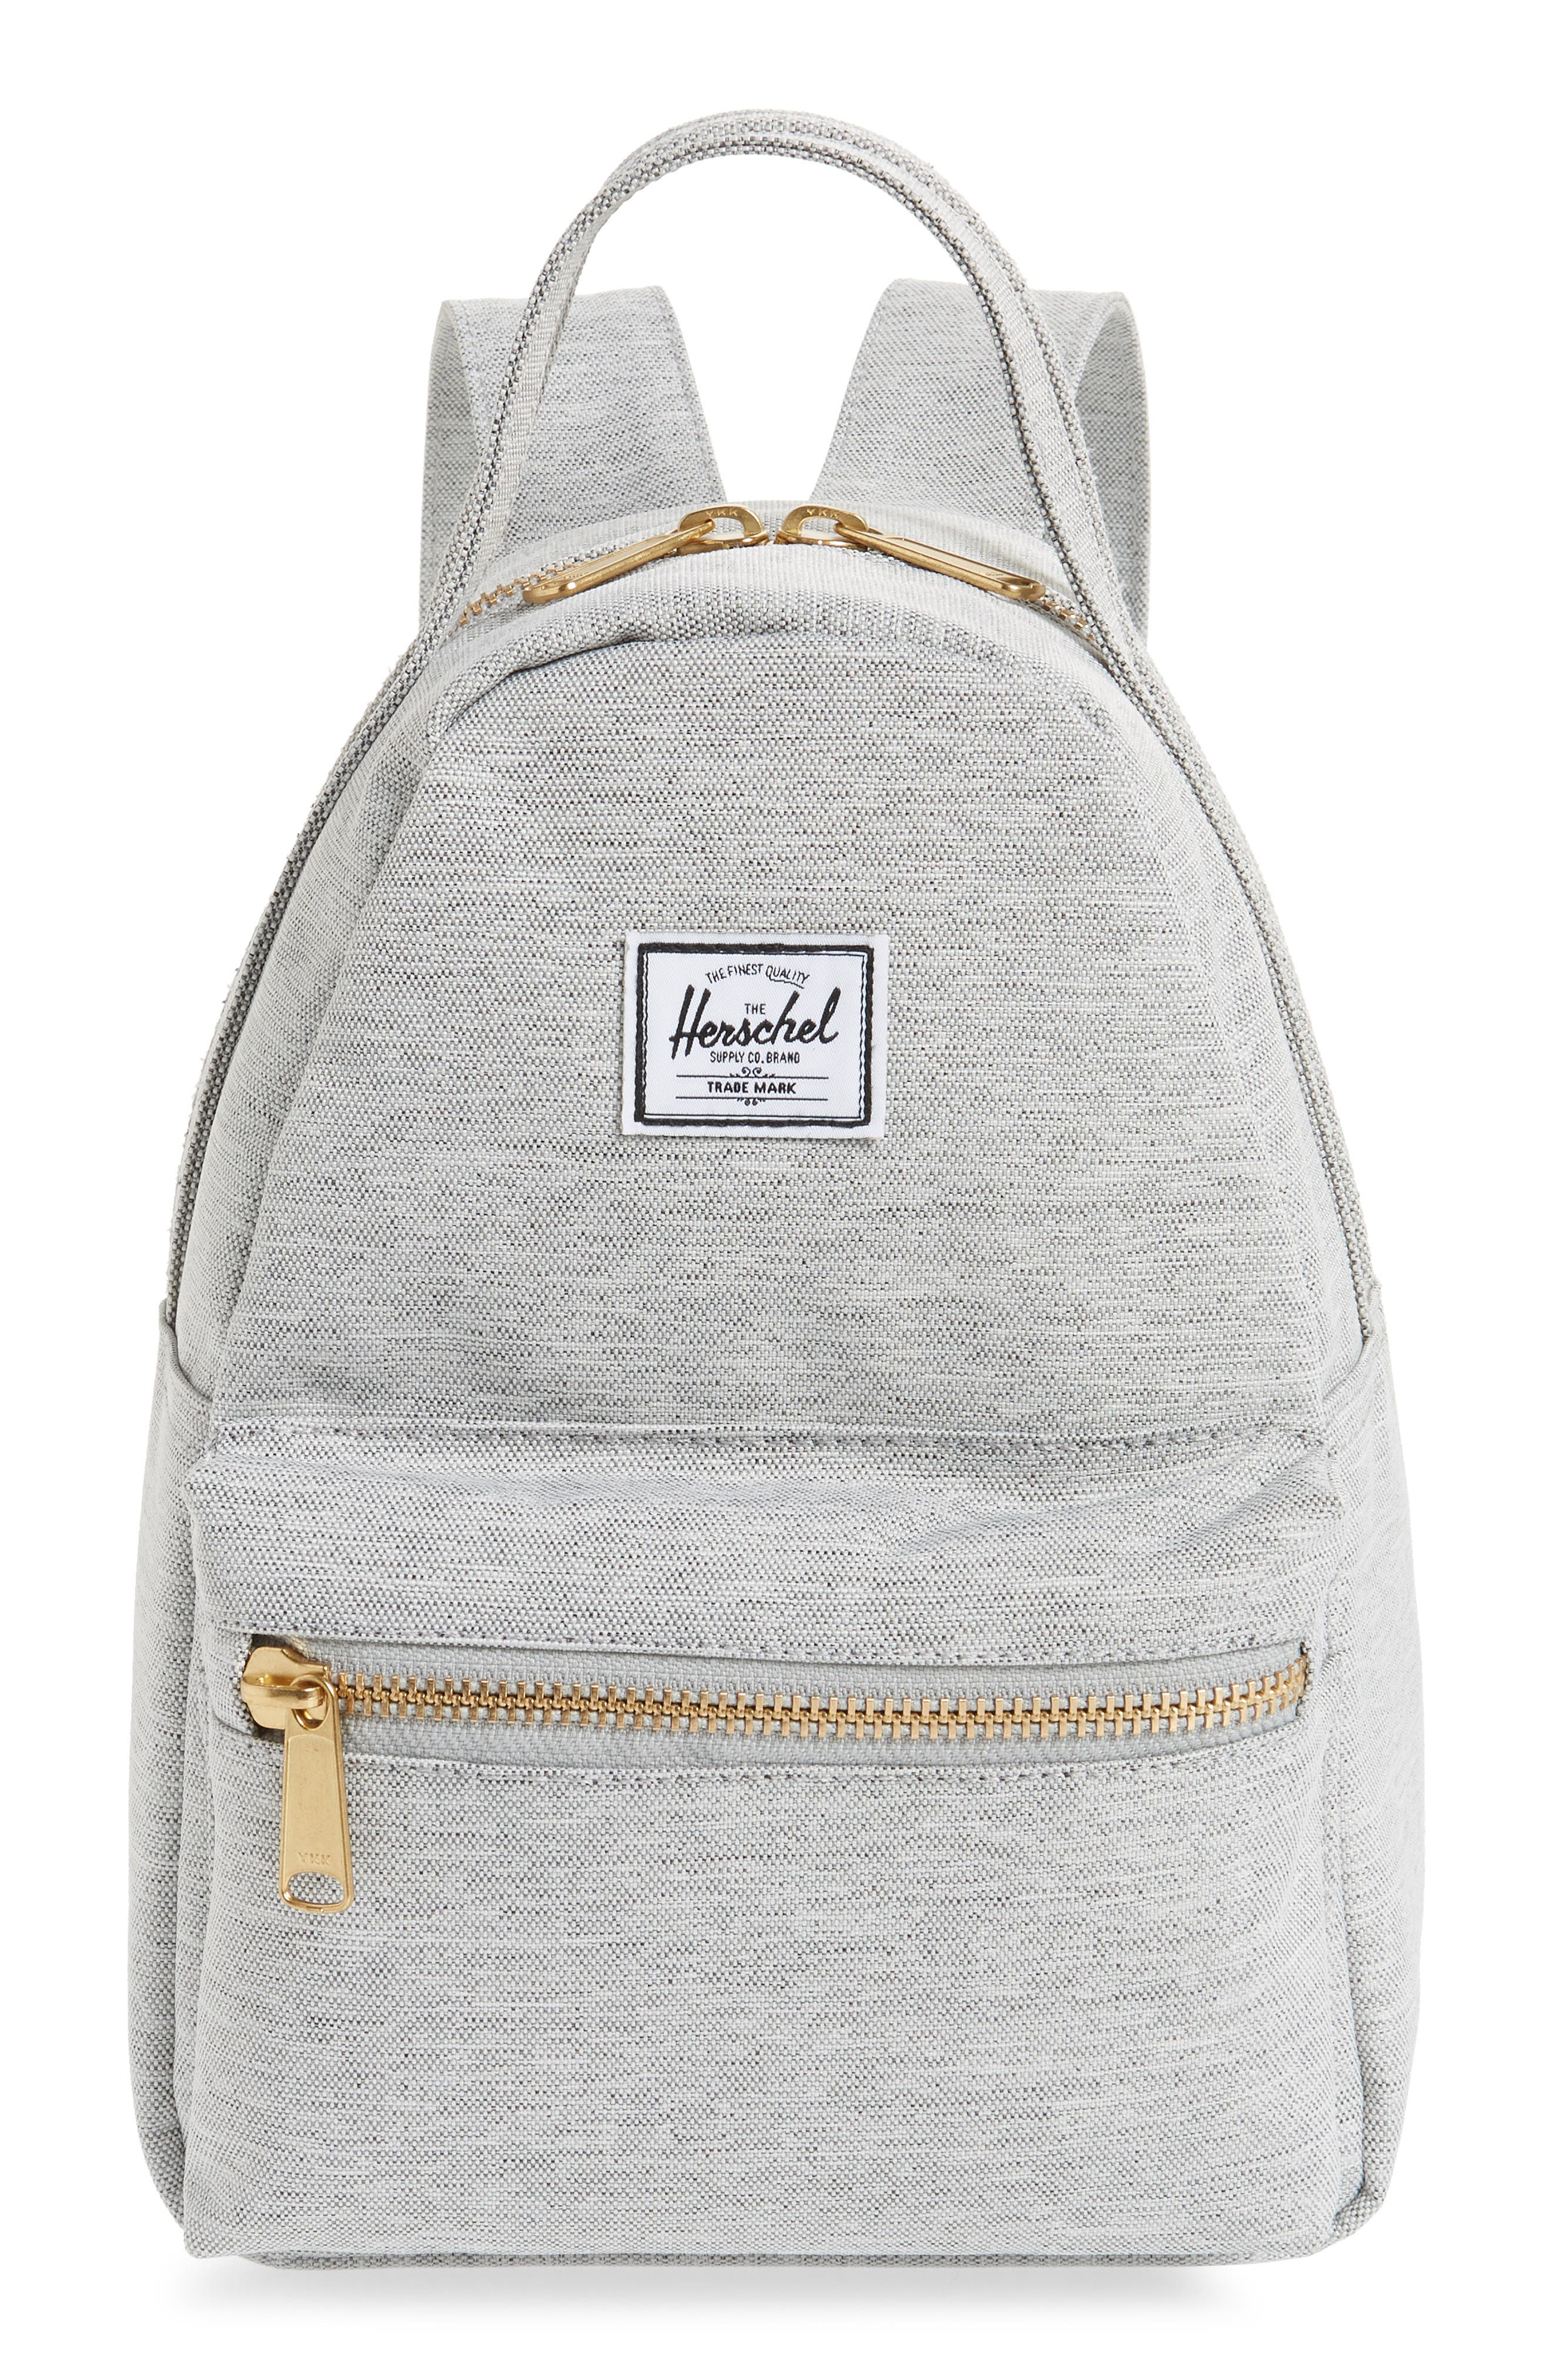 Mini Nova Backpack,                             Main thumbnail 1, color,                             LIGHT GREY CROSSHATCH